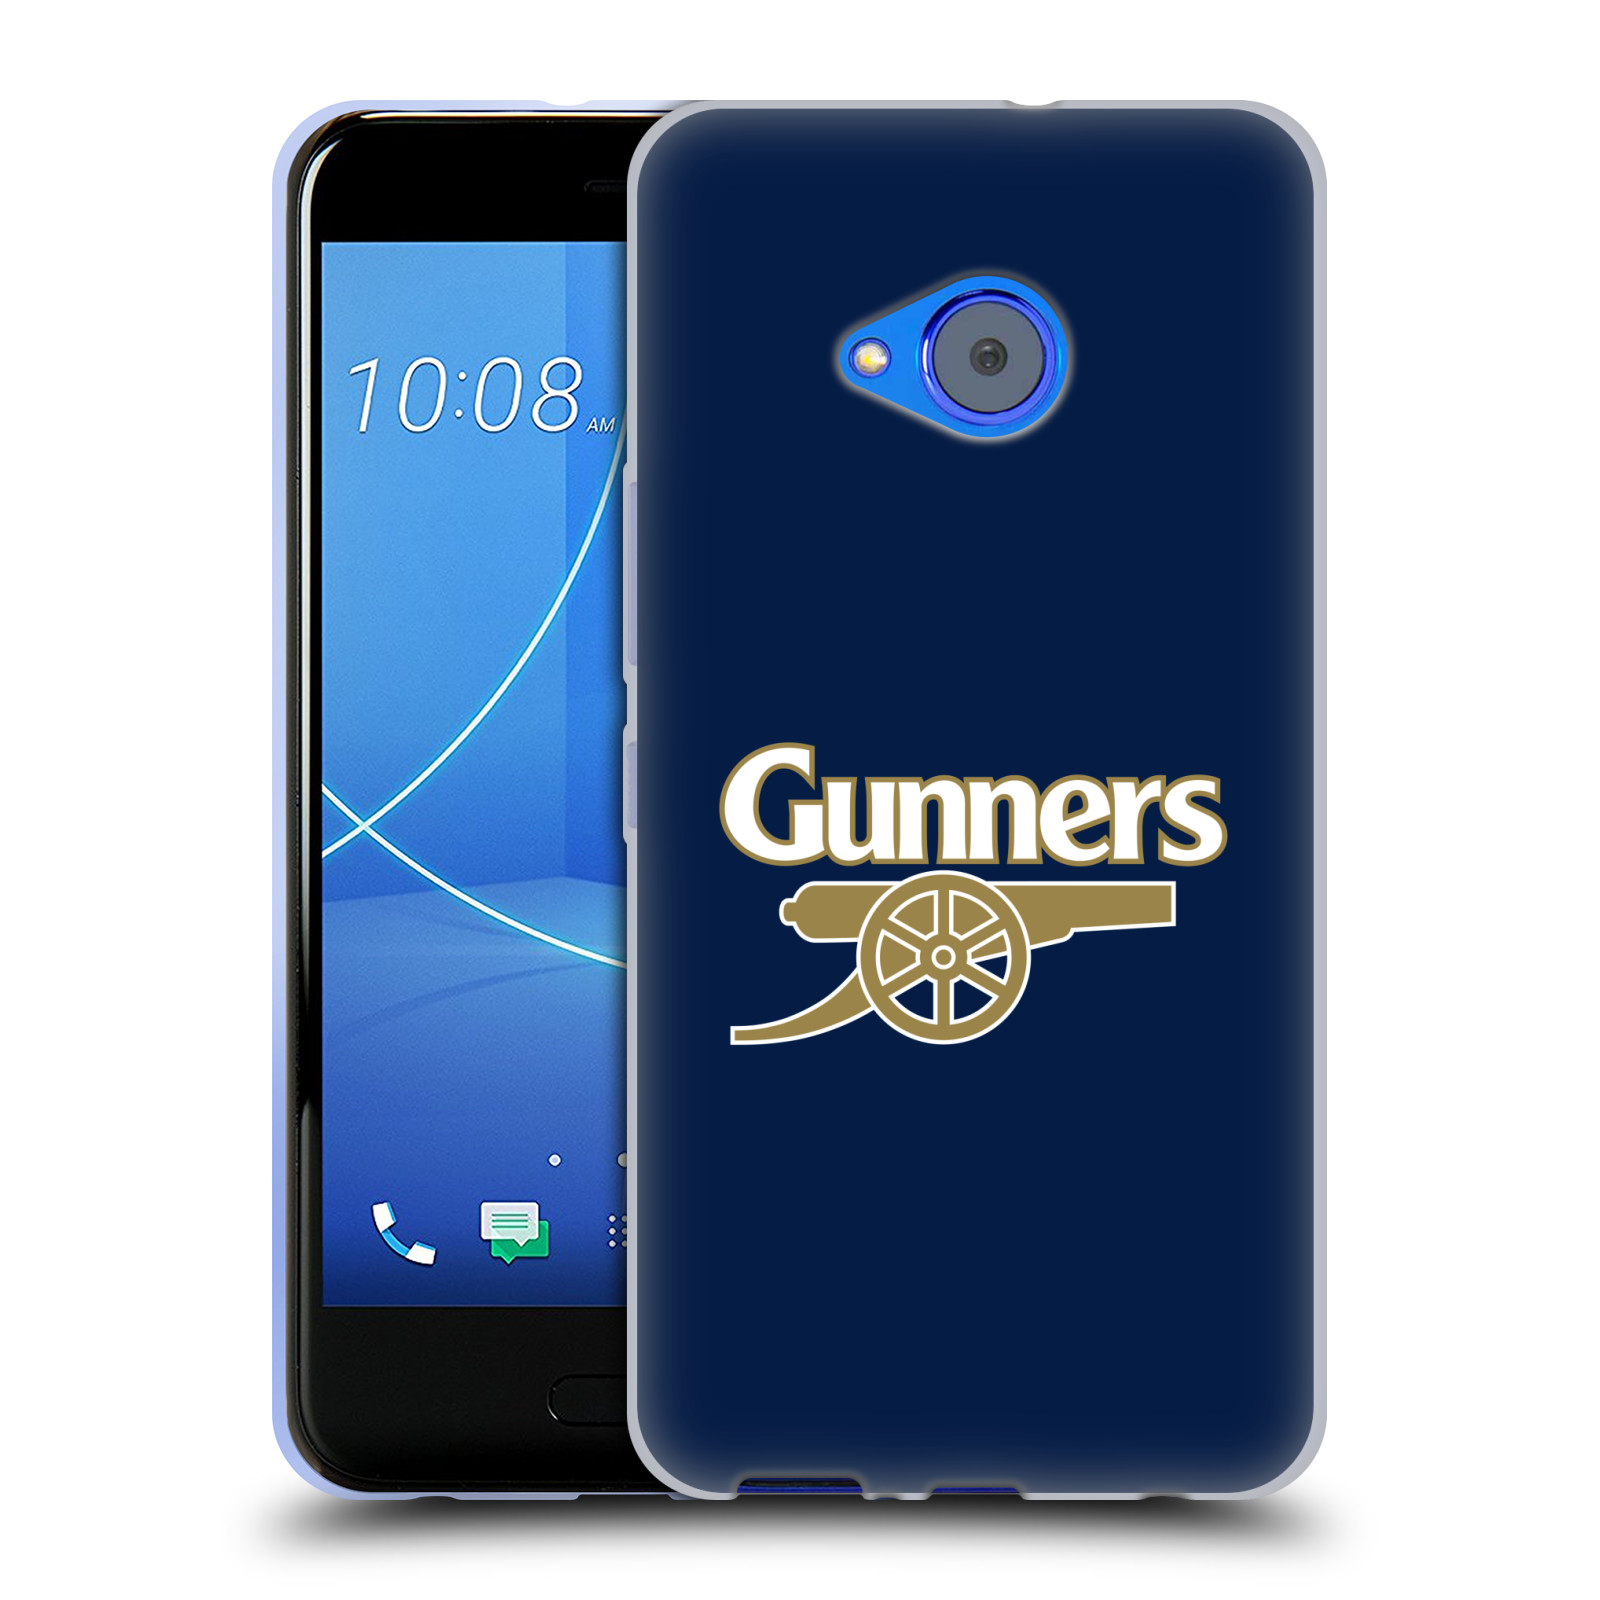 Silikonové pouzdro na mobil HTC U11 Life - Head Case - Arsenal FC - Gunners